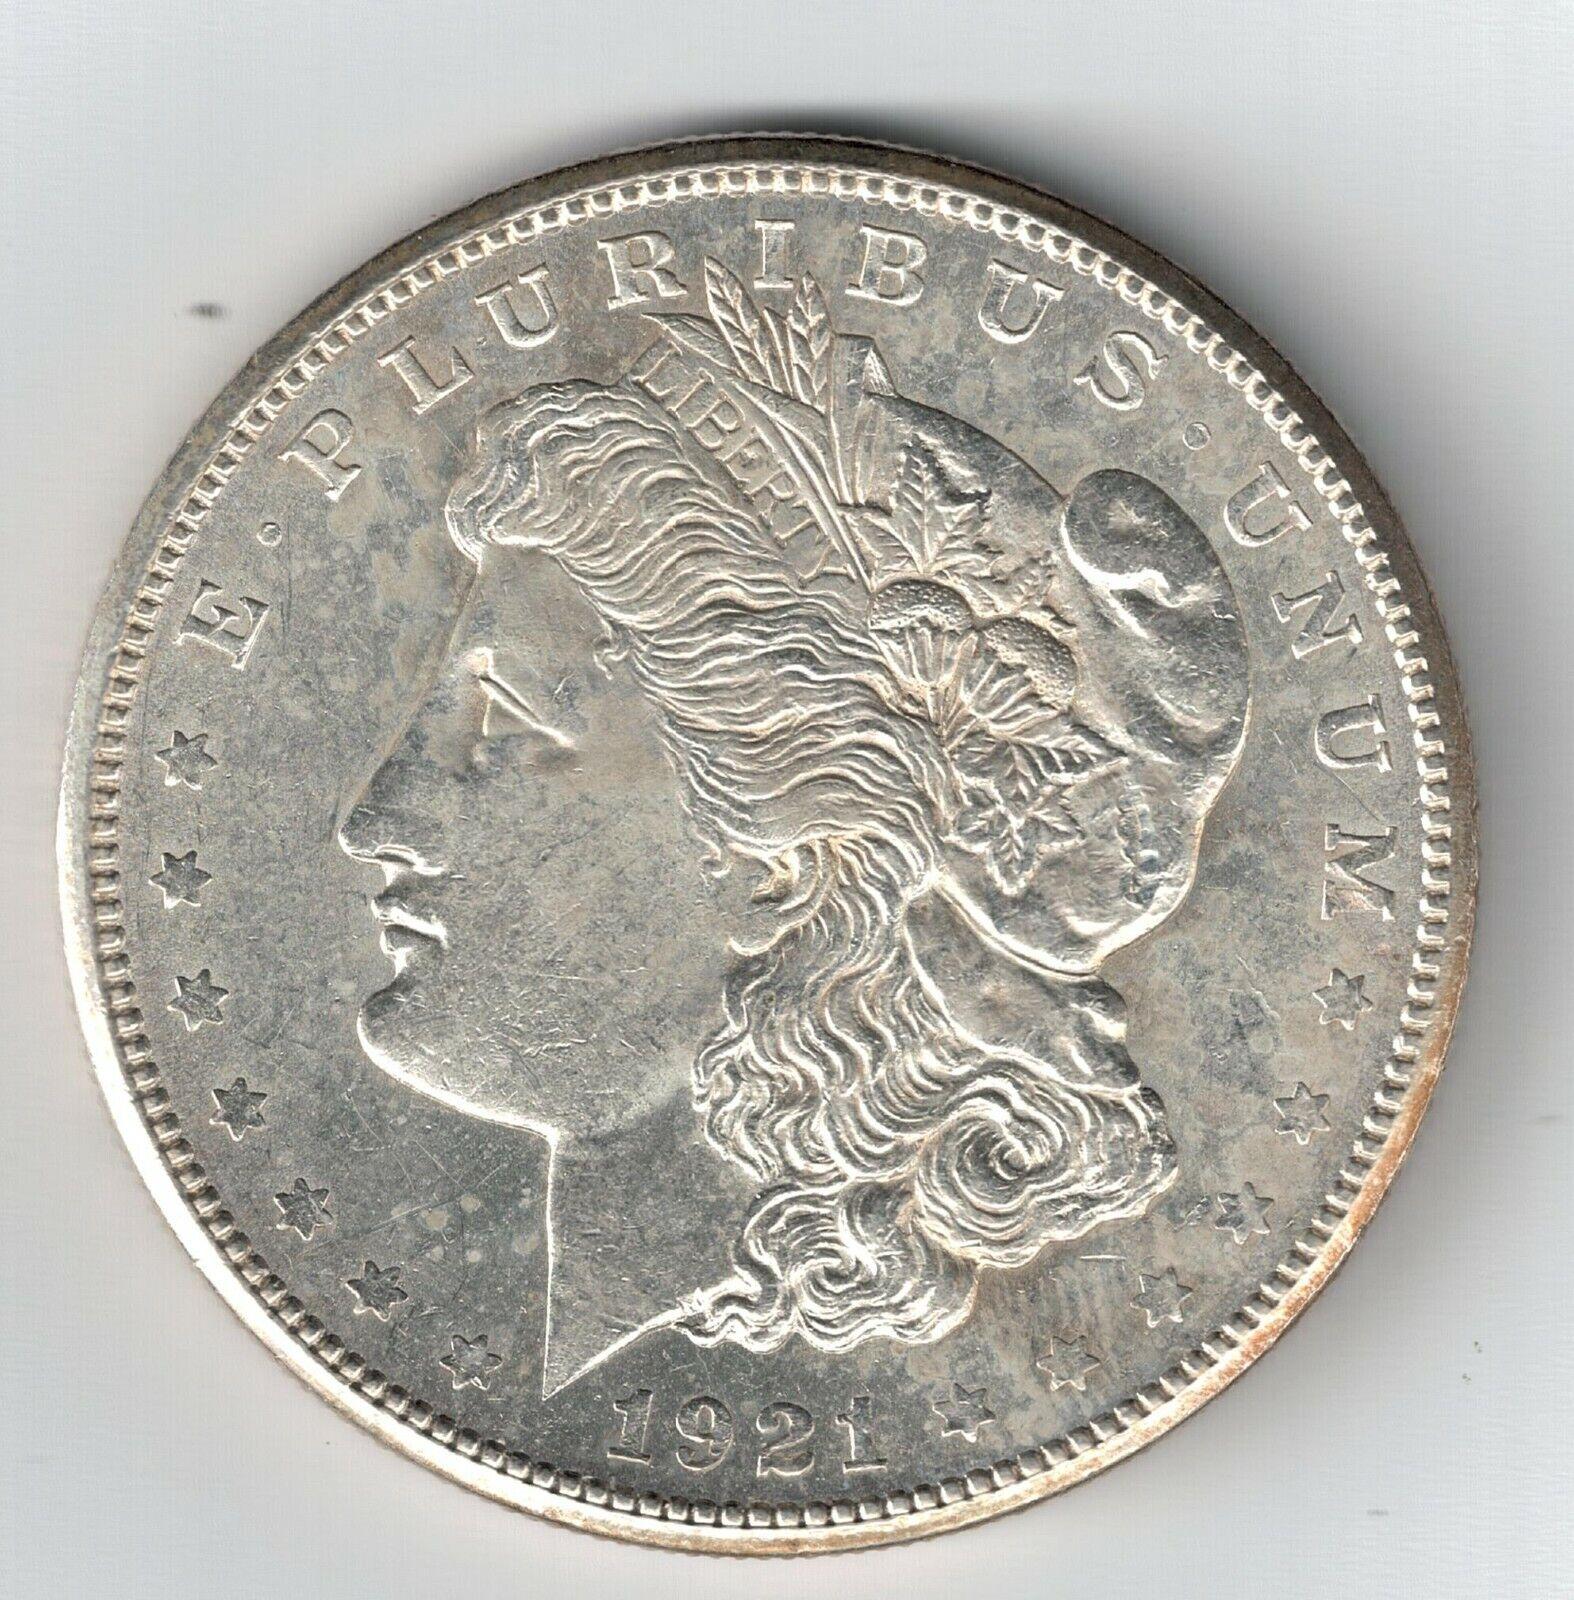 1921 S Morgan Silver Dollar XF/AU Coin Free Shipping 1921S - $40.00